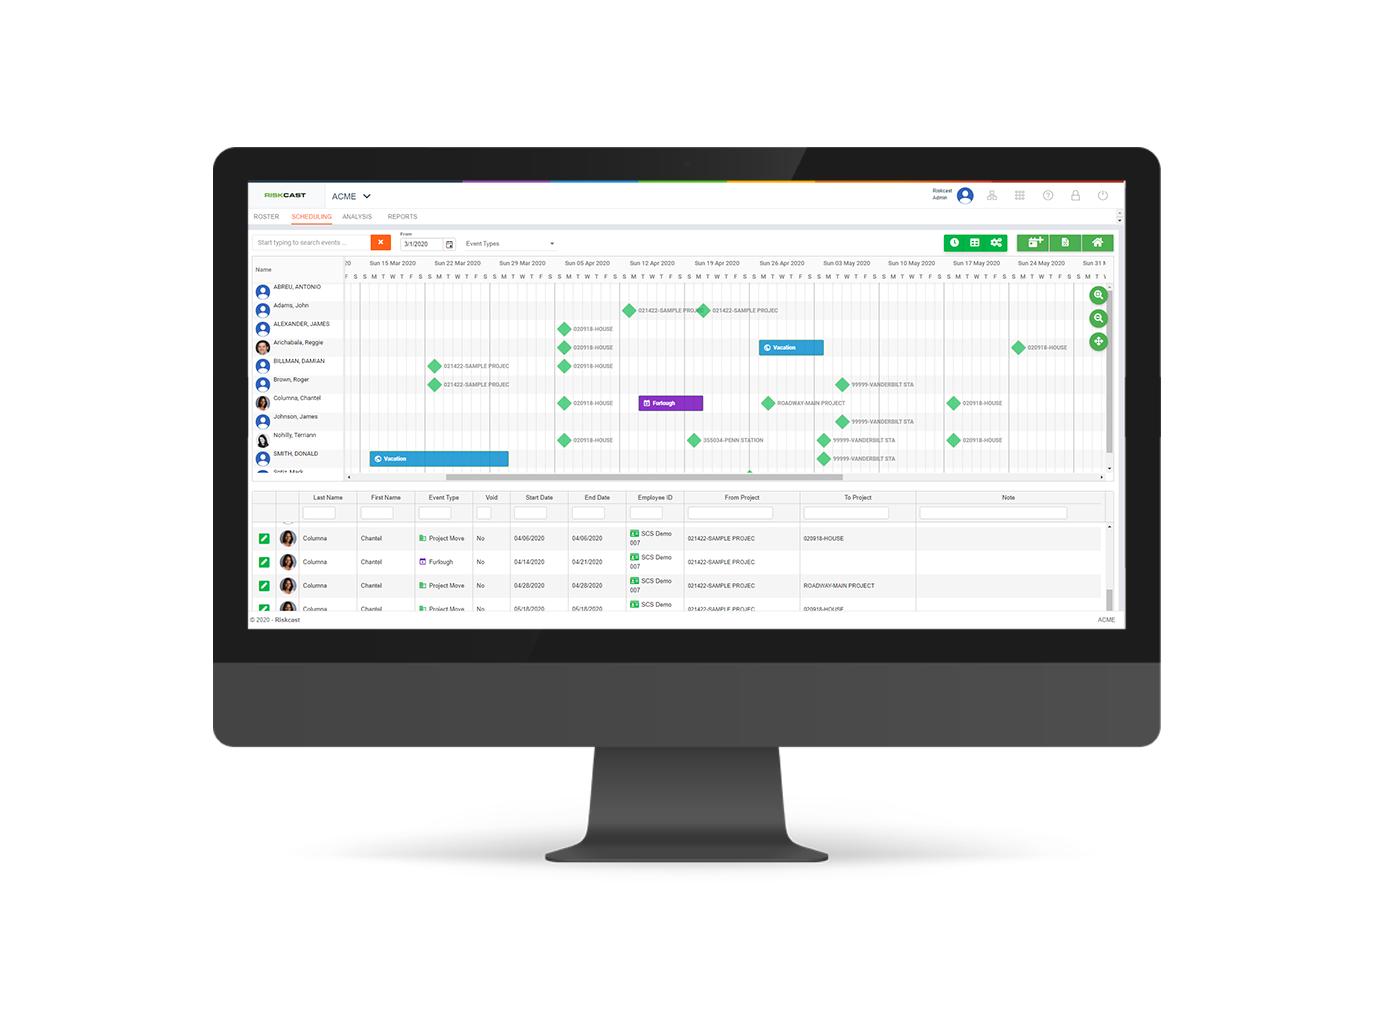 Riskcast's Manpower Tracking Capability